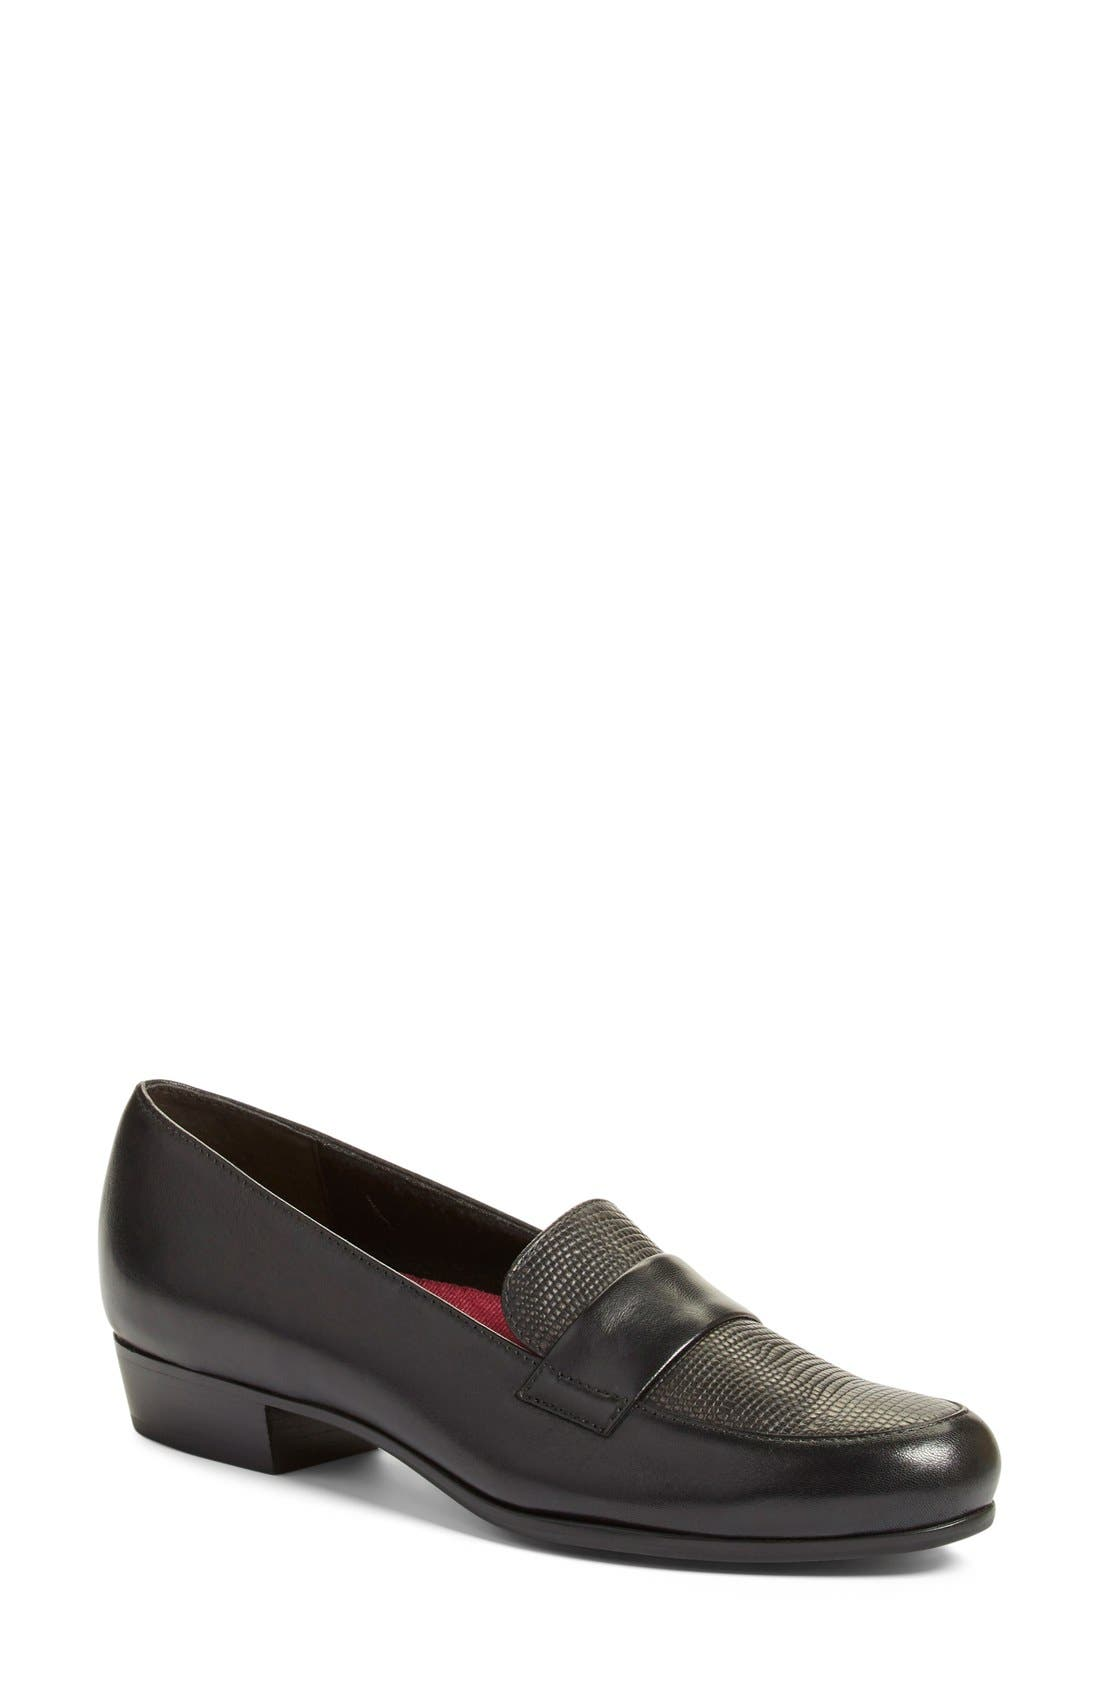 'Kiera' Loafer,                         Main,                         color, Black Lizard Print Leather